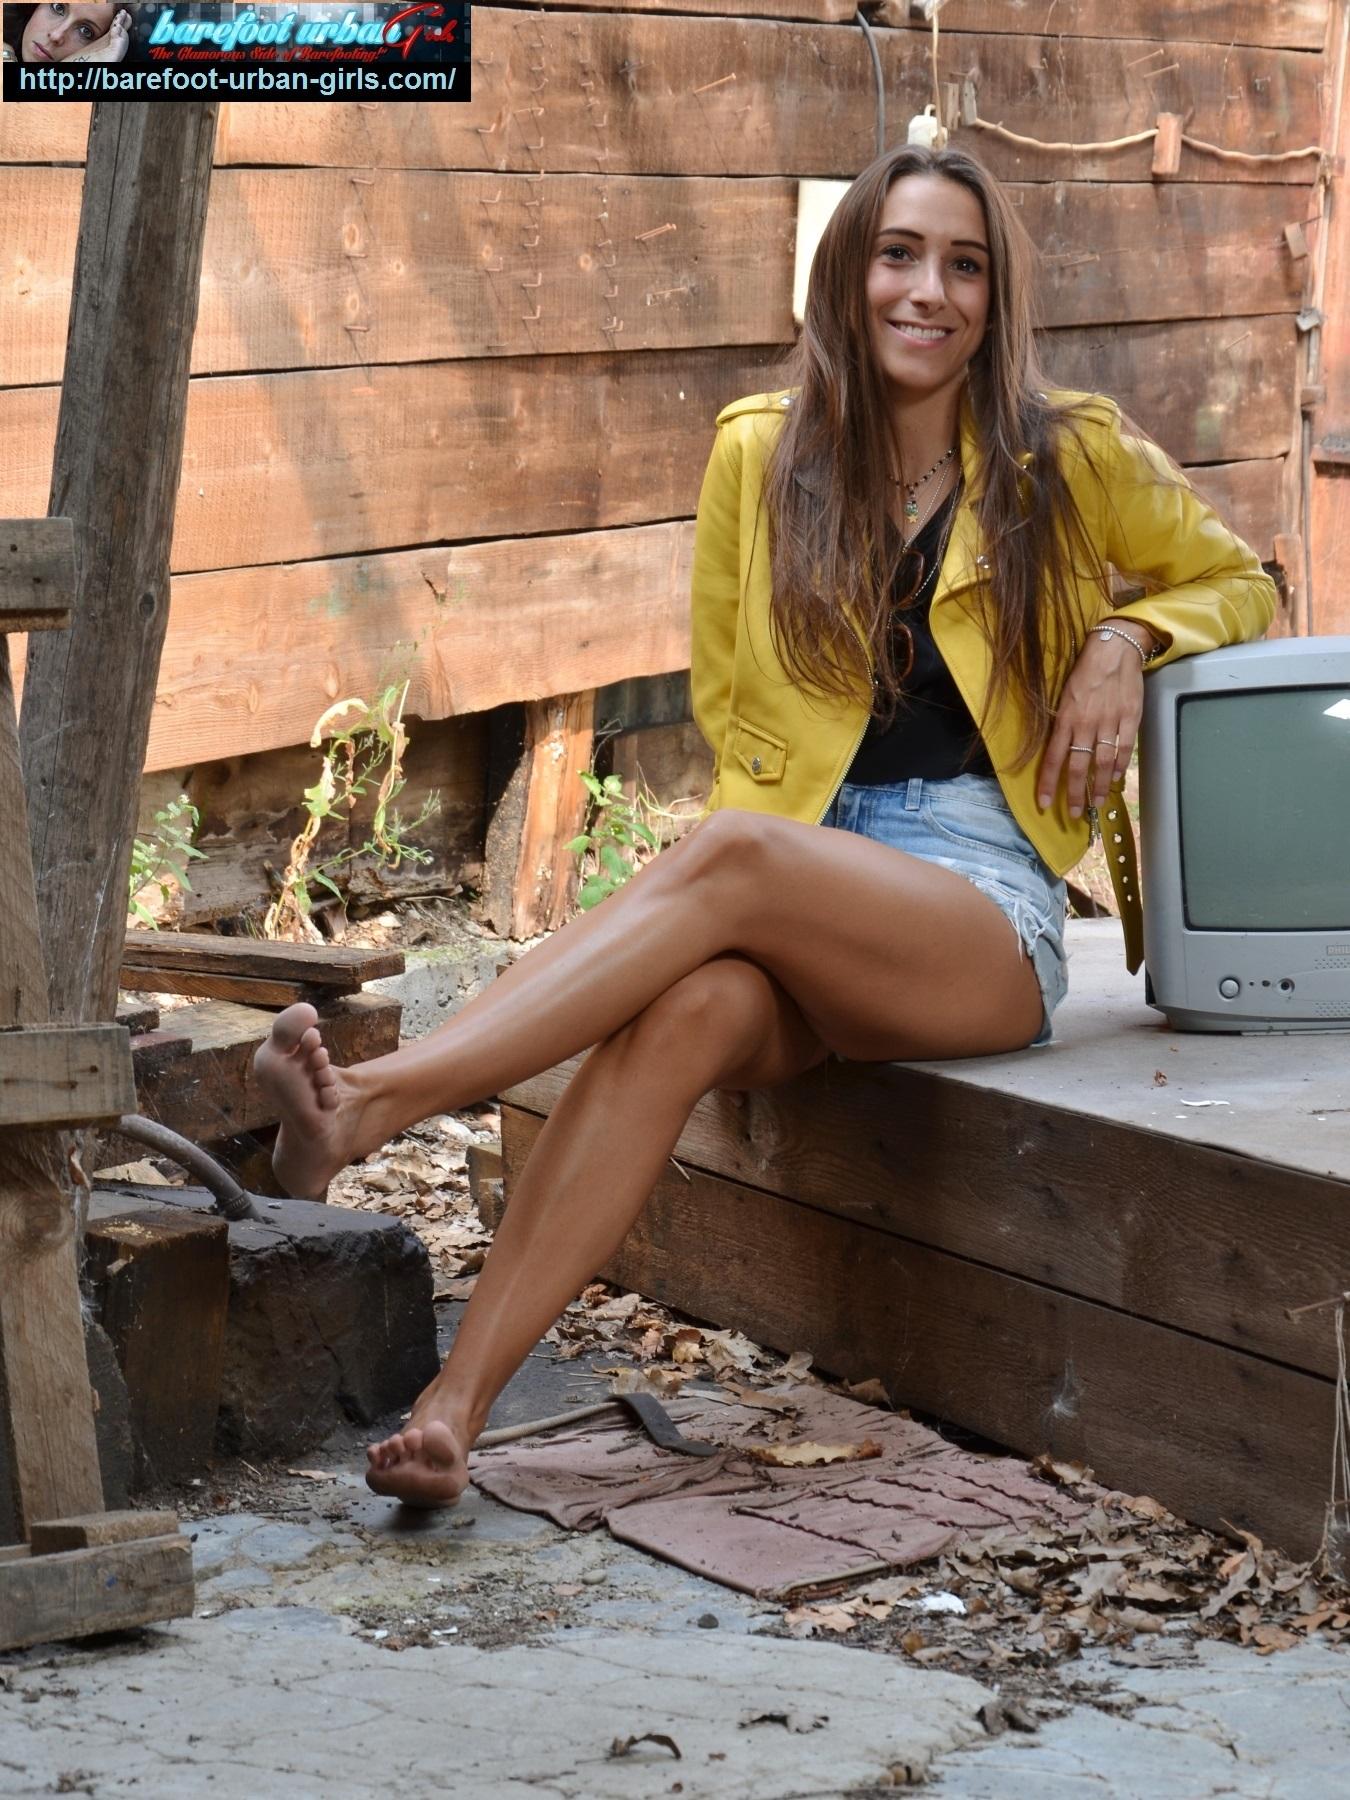 Beautiful barefoot latina in her city - 4   Feet File